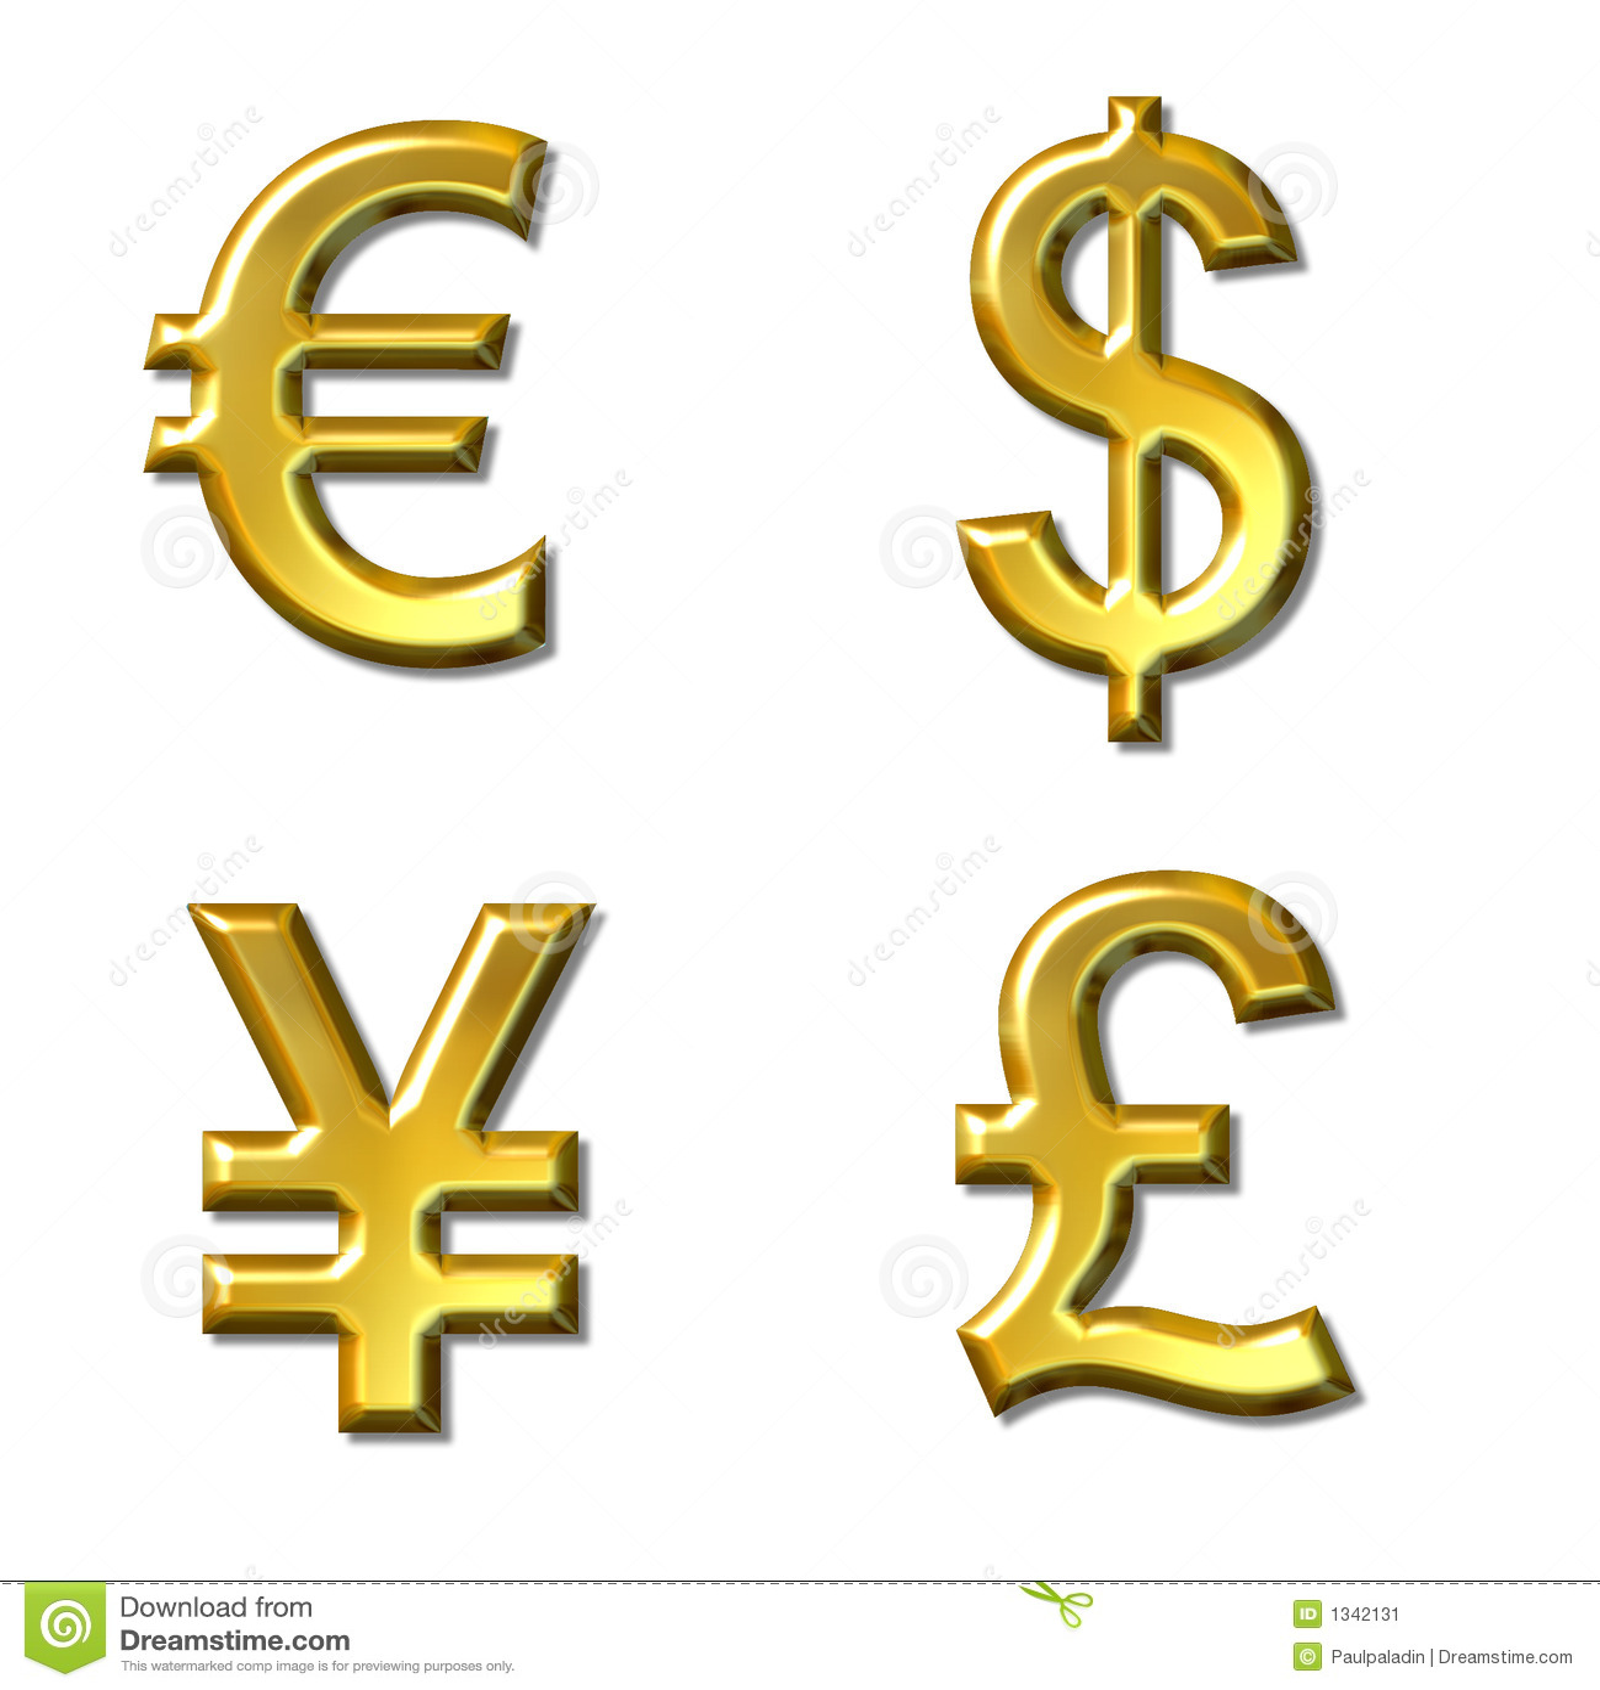 Currency symbols stock illustration illustration of money 1342131 currency symbols biocorpaavc Choice Image